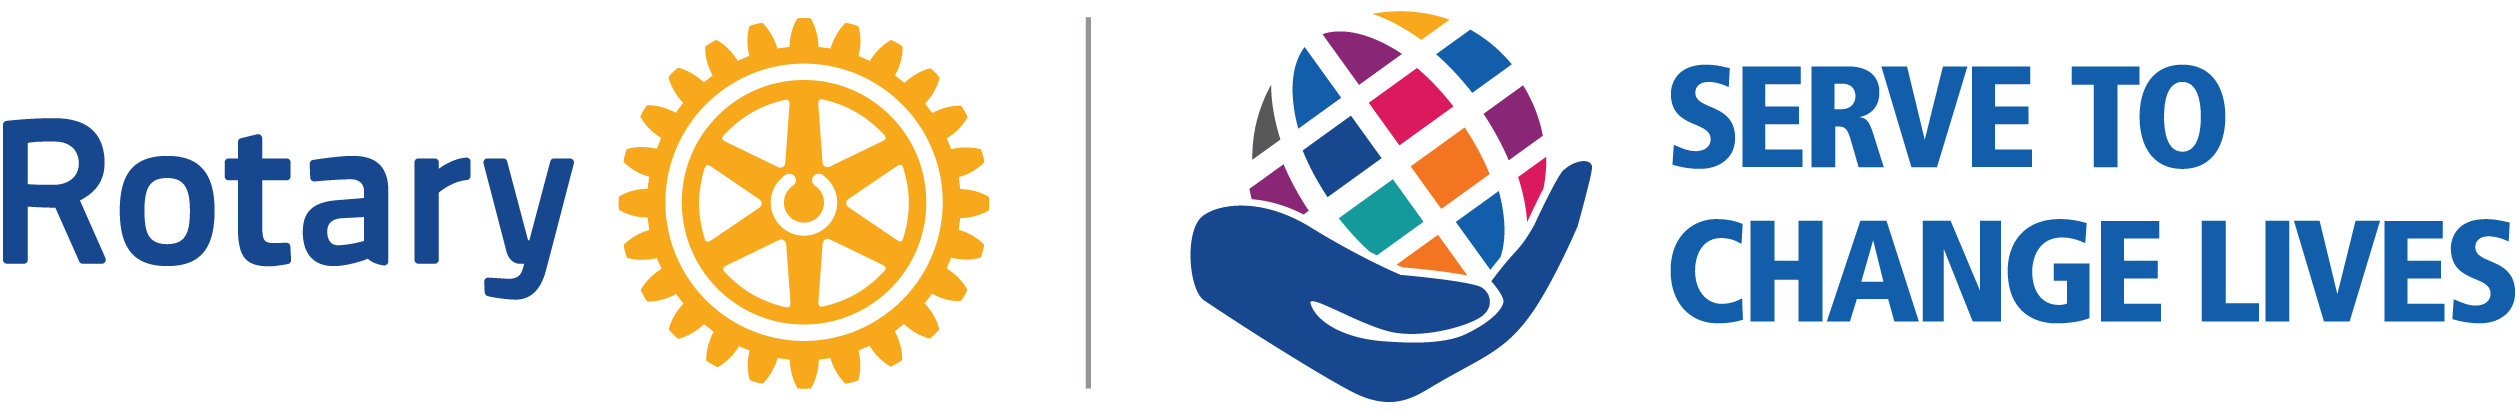 Rotary International Theme with Masterbrand - Simple - RGB